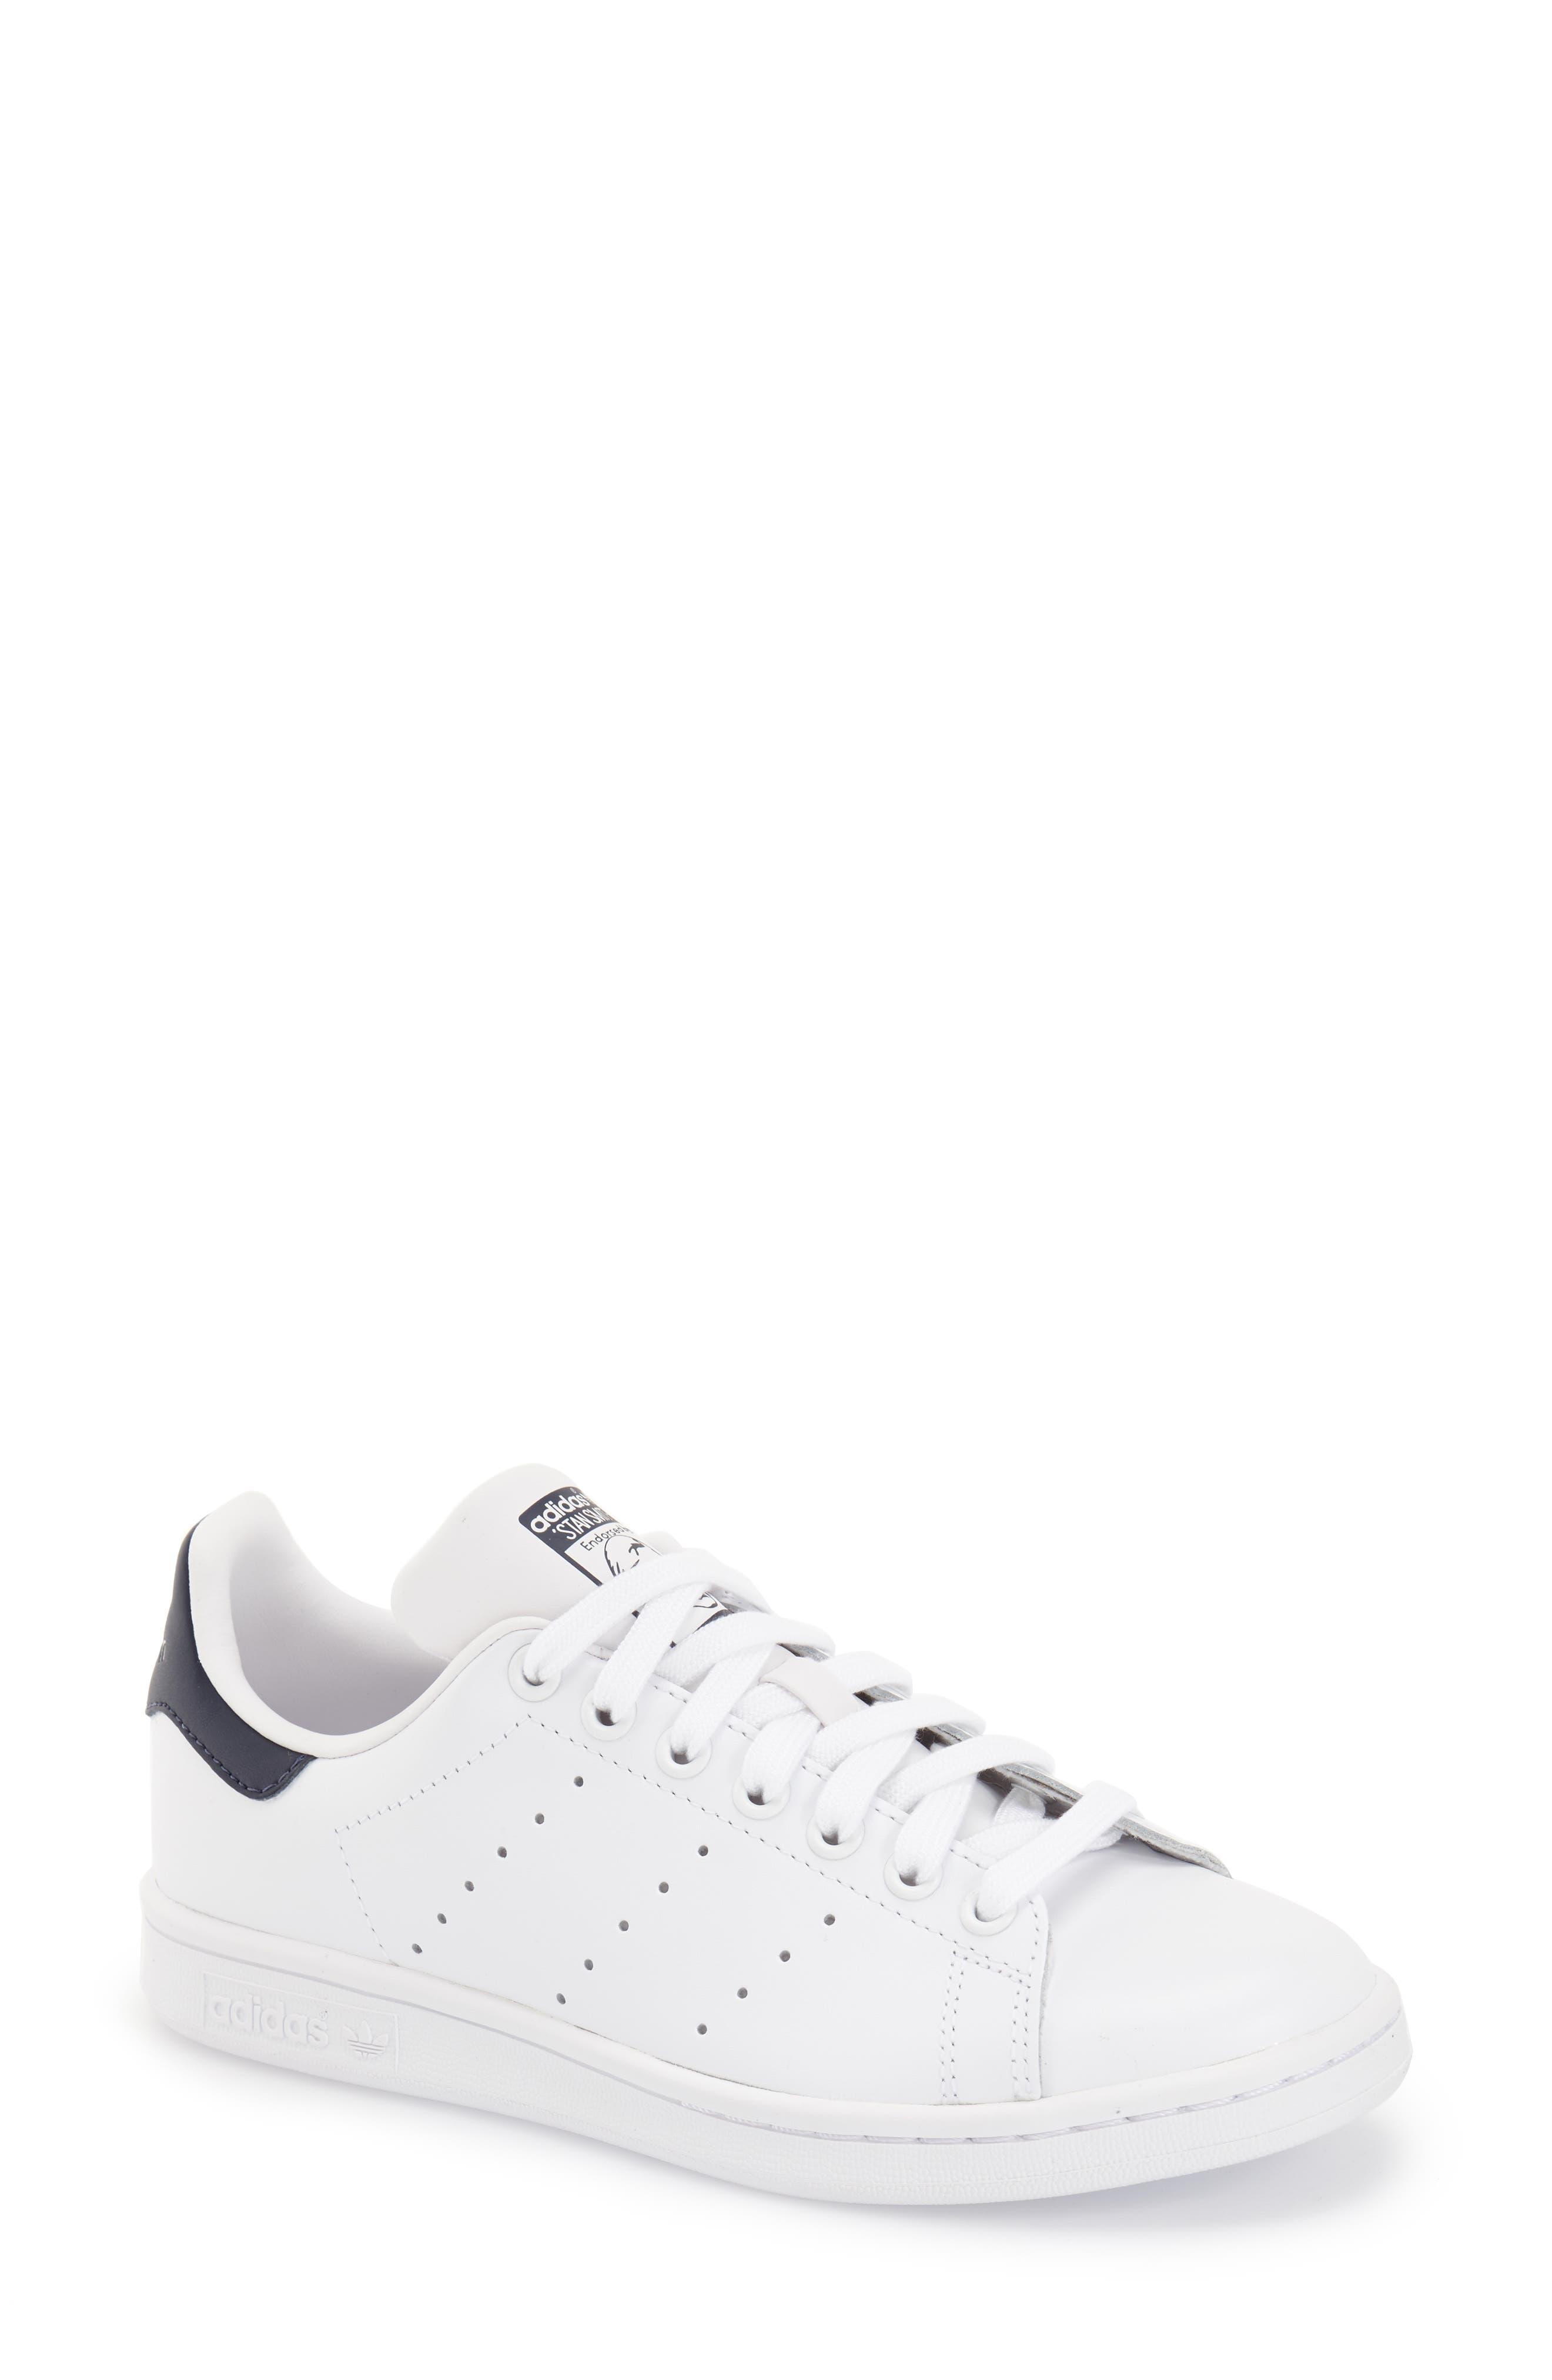 Main Image - adidas Stan Smith Sneaker (Women)